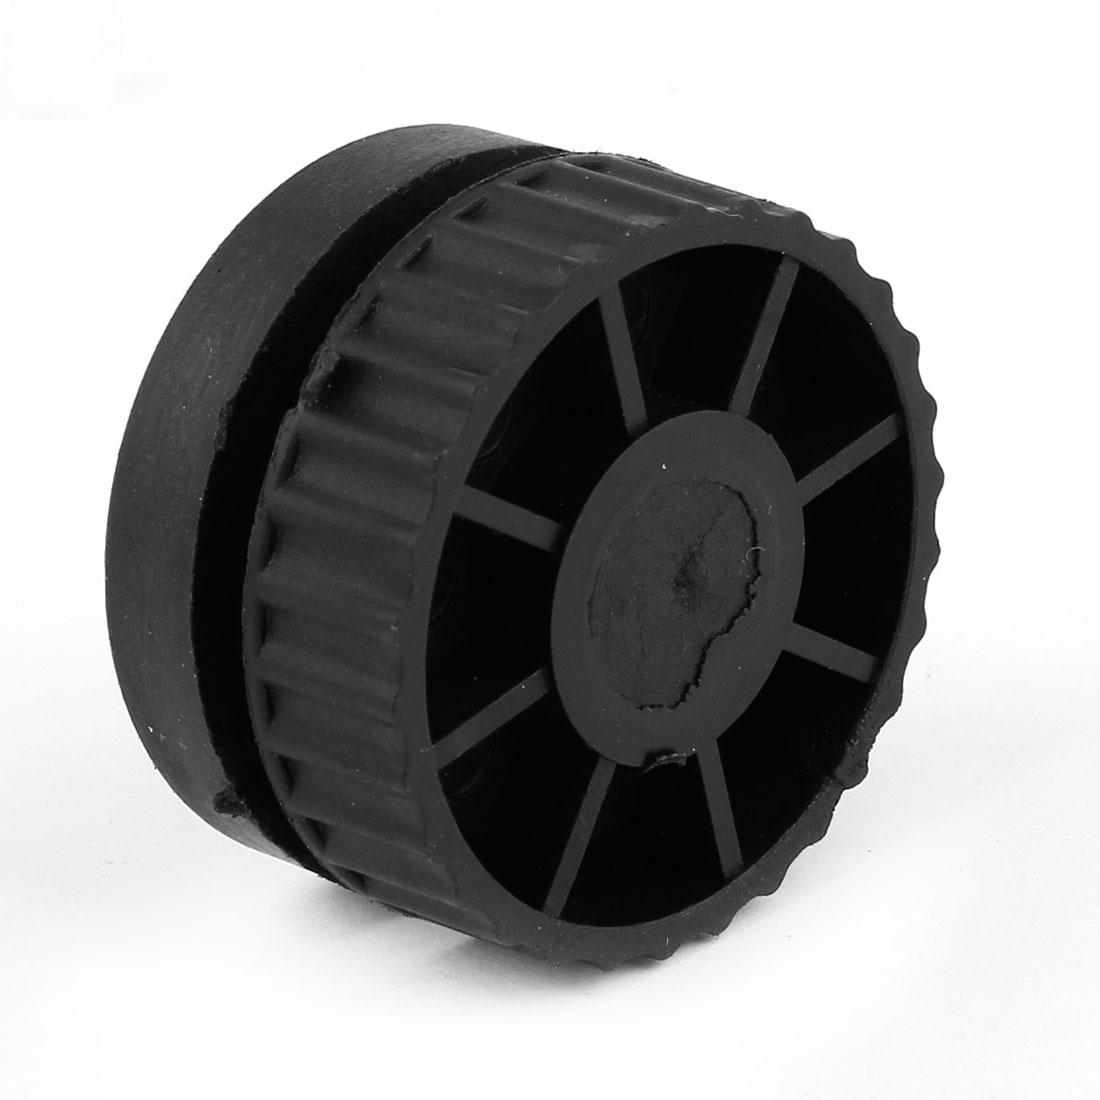 14mm Chain Saw Sharpener Grinding Wheel Machine Locking Screw Nut Set